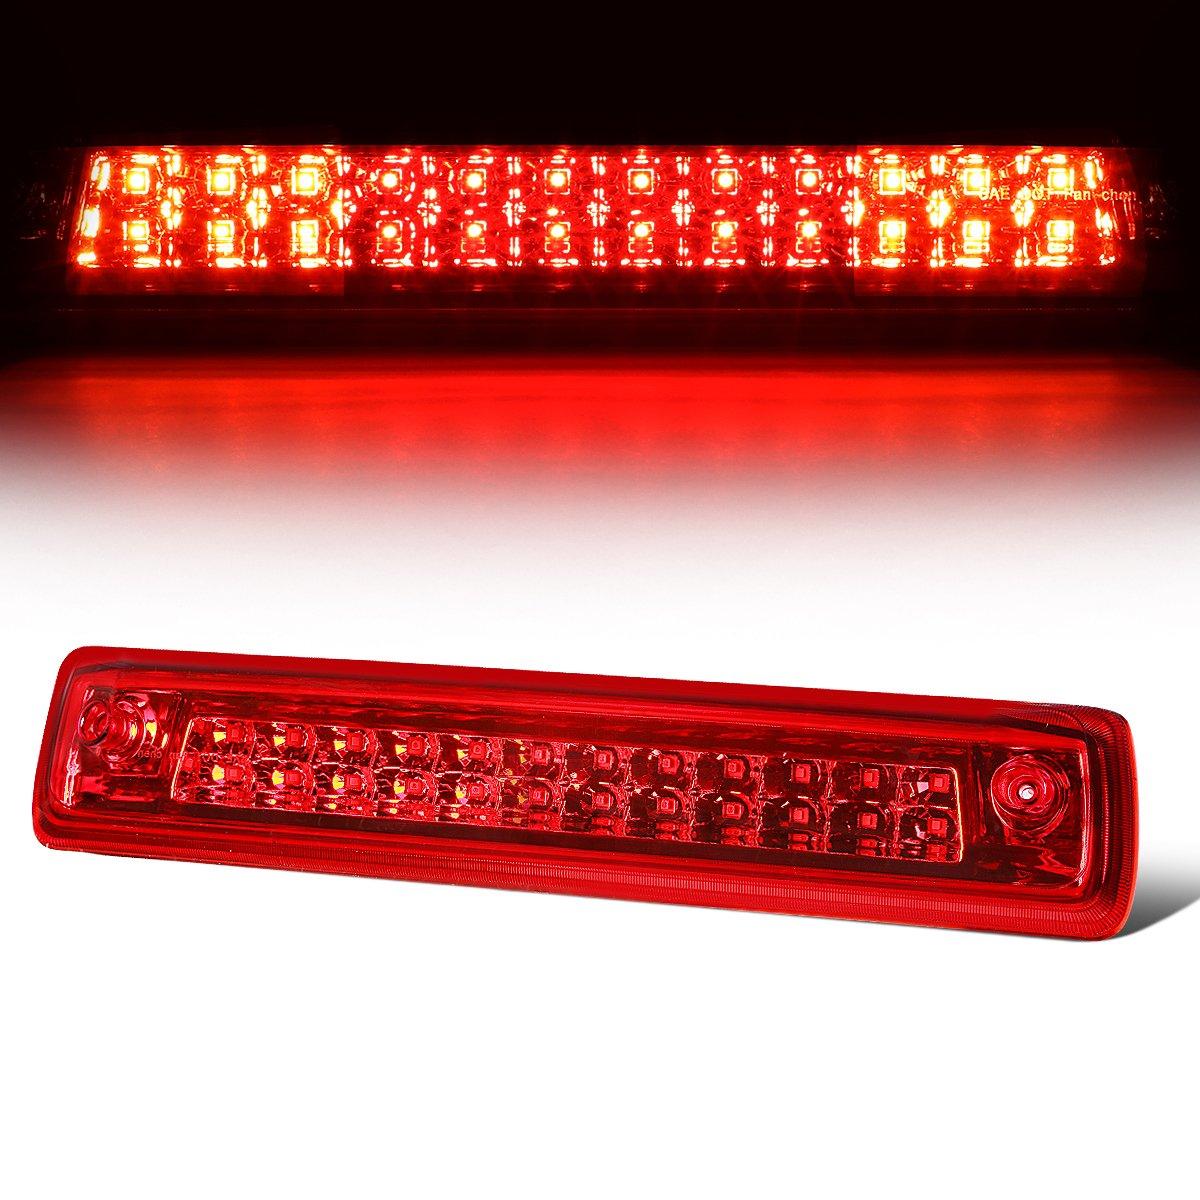 For Chevy Colorado/GMC Canyon Black Housing Smoke Lens LED High Mount 3rd Brake Light Lamp Auto Dynasty